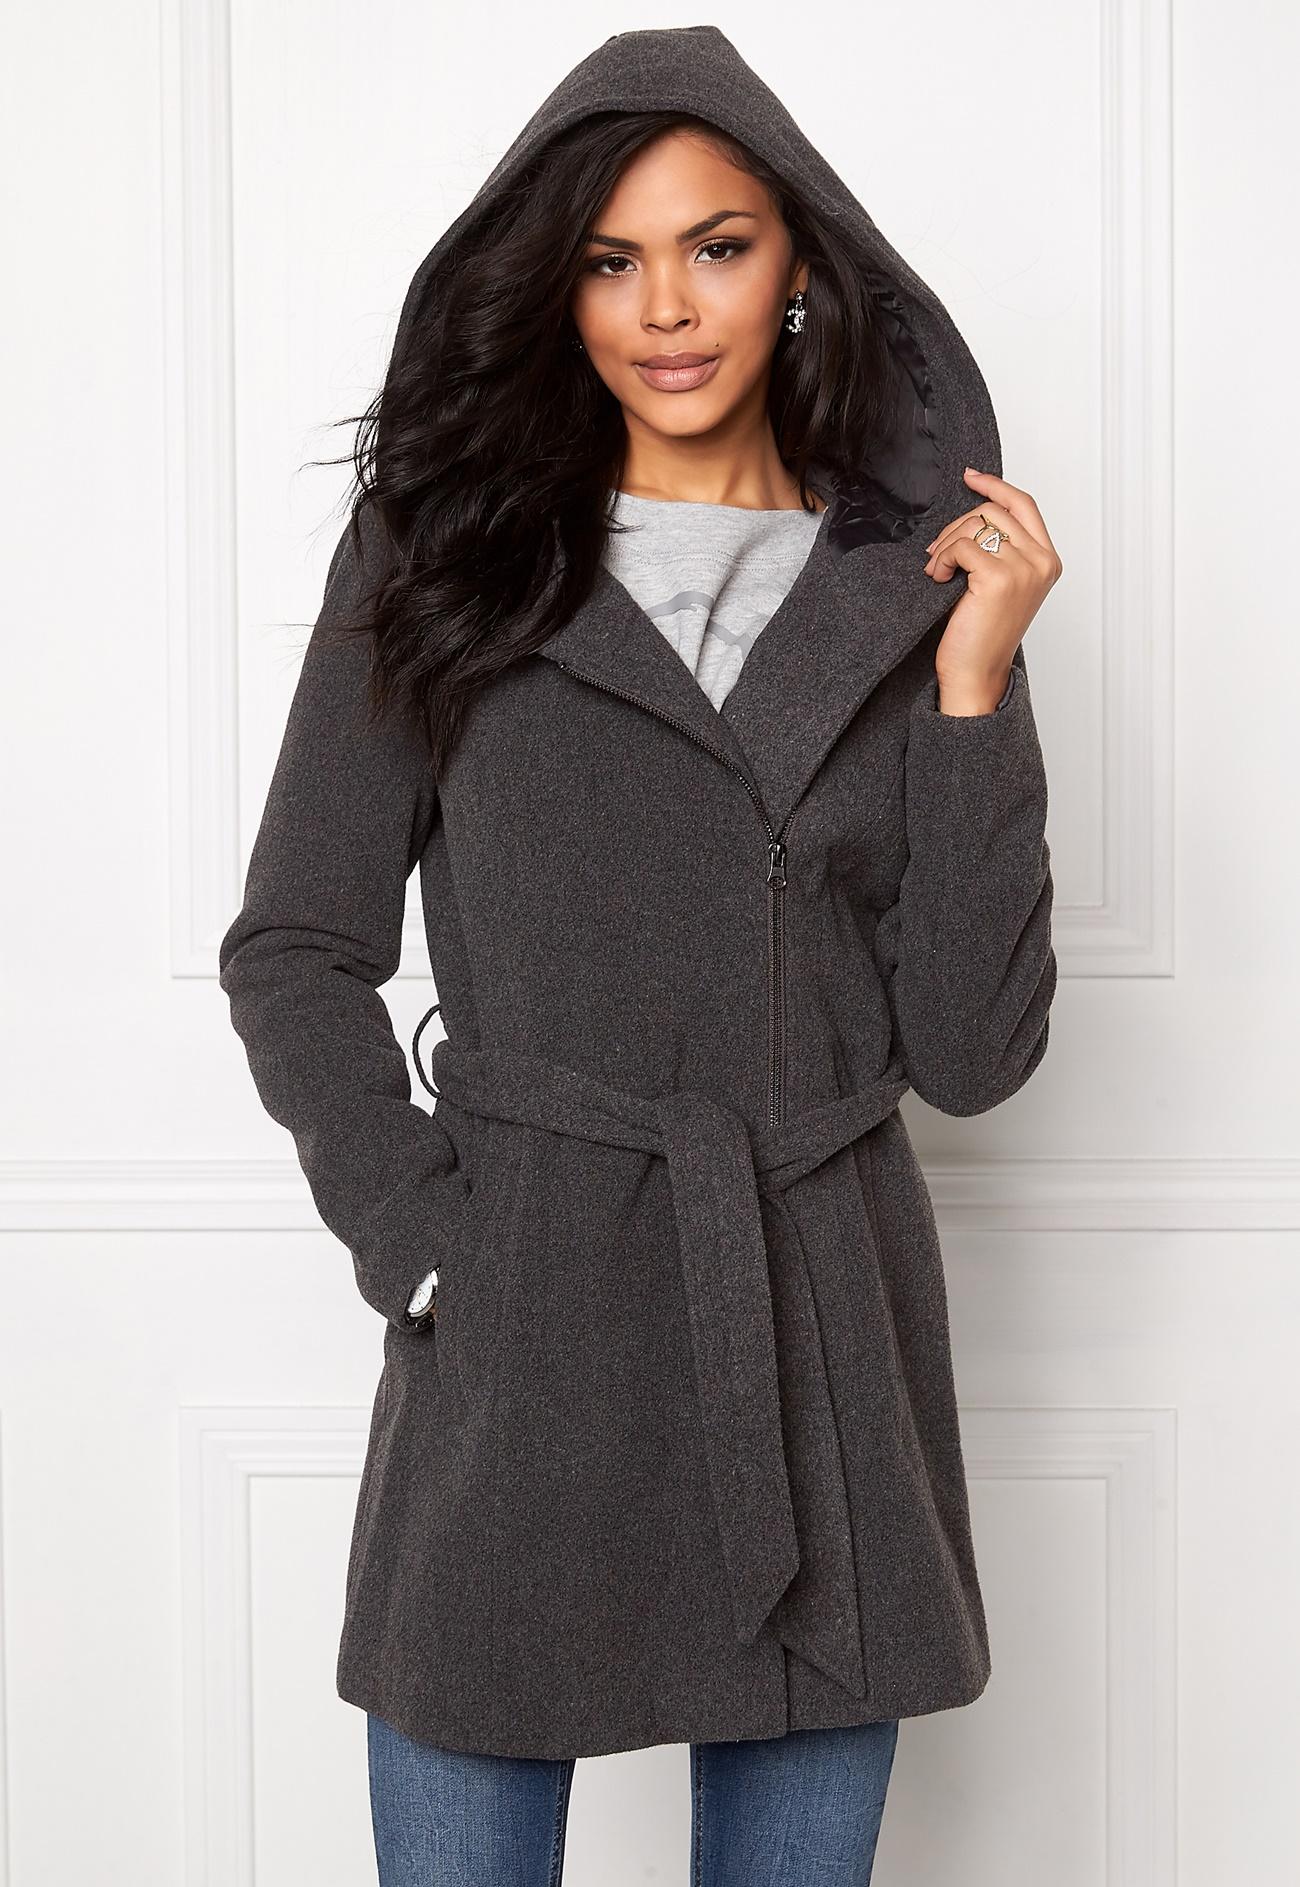 vero moda joyce daisy 3 4 jacket medium grey melange bubbleroom. Black Bedroom Furniture Sets. Home Design Ideas